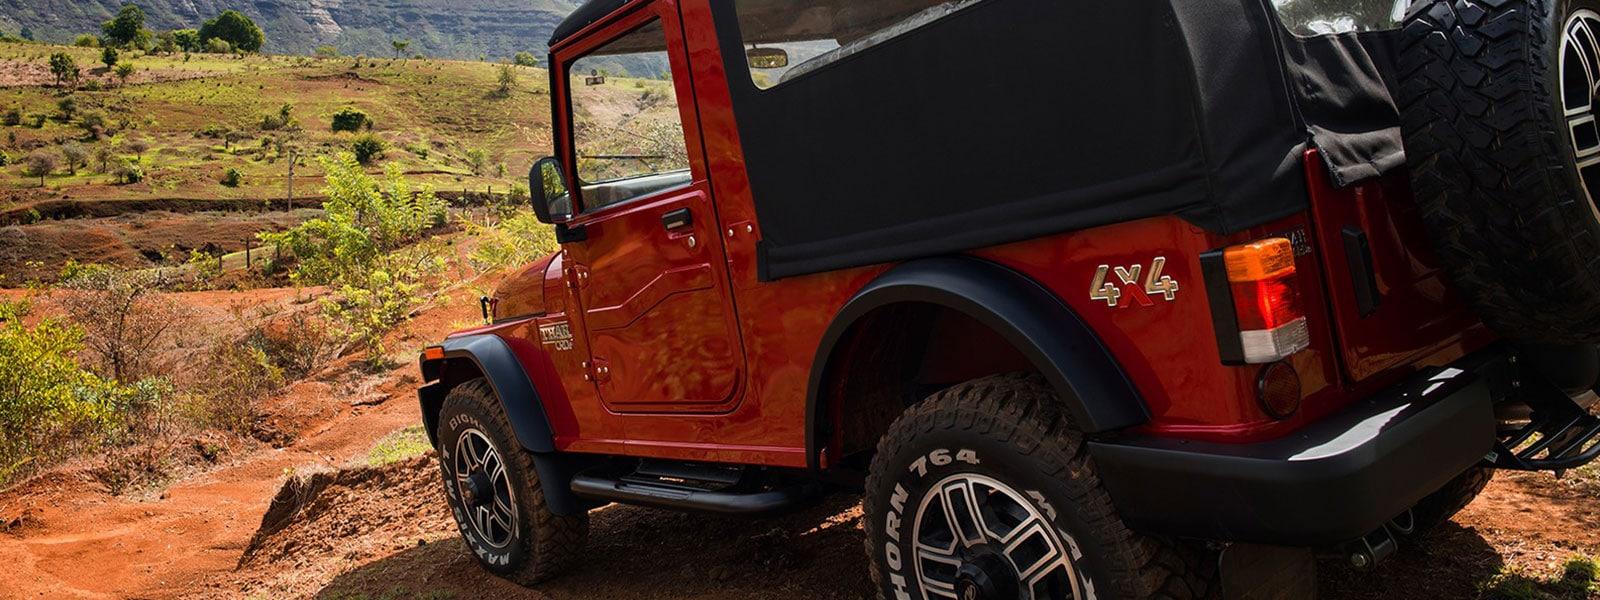 Borg Warner 4WD system with 2.48 crawl ratio